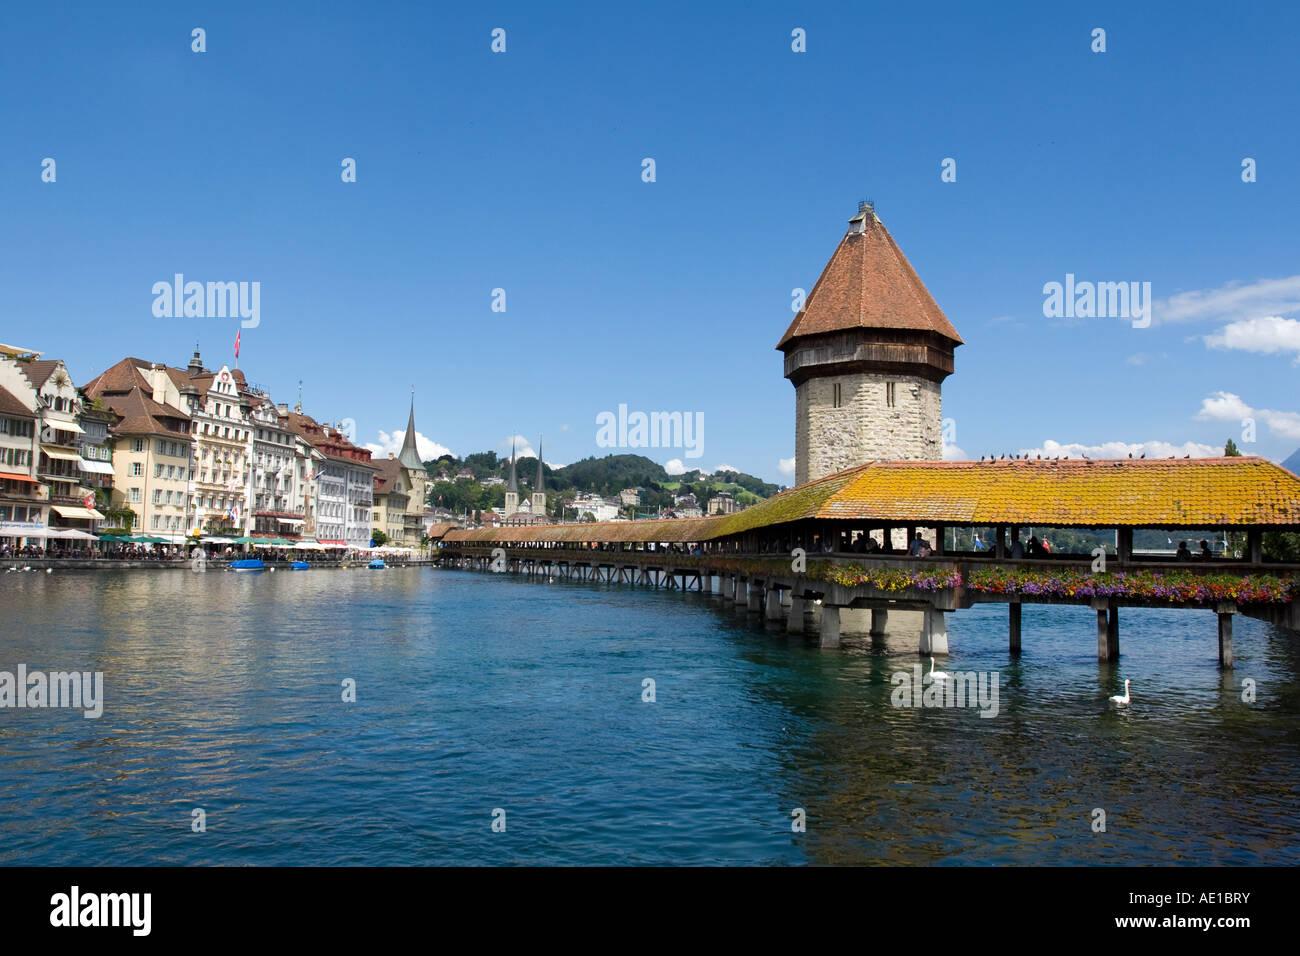 chapell bridge panorama - Stock Image